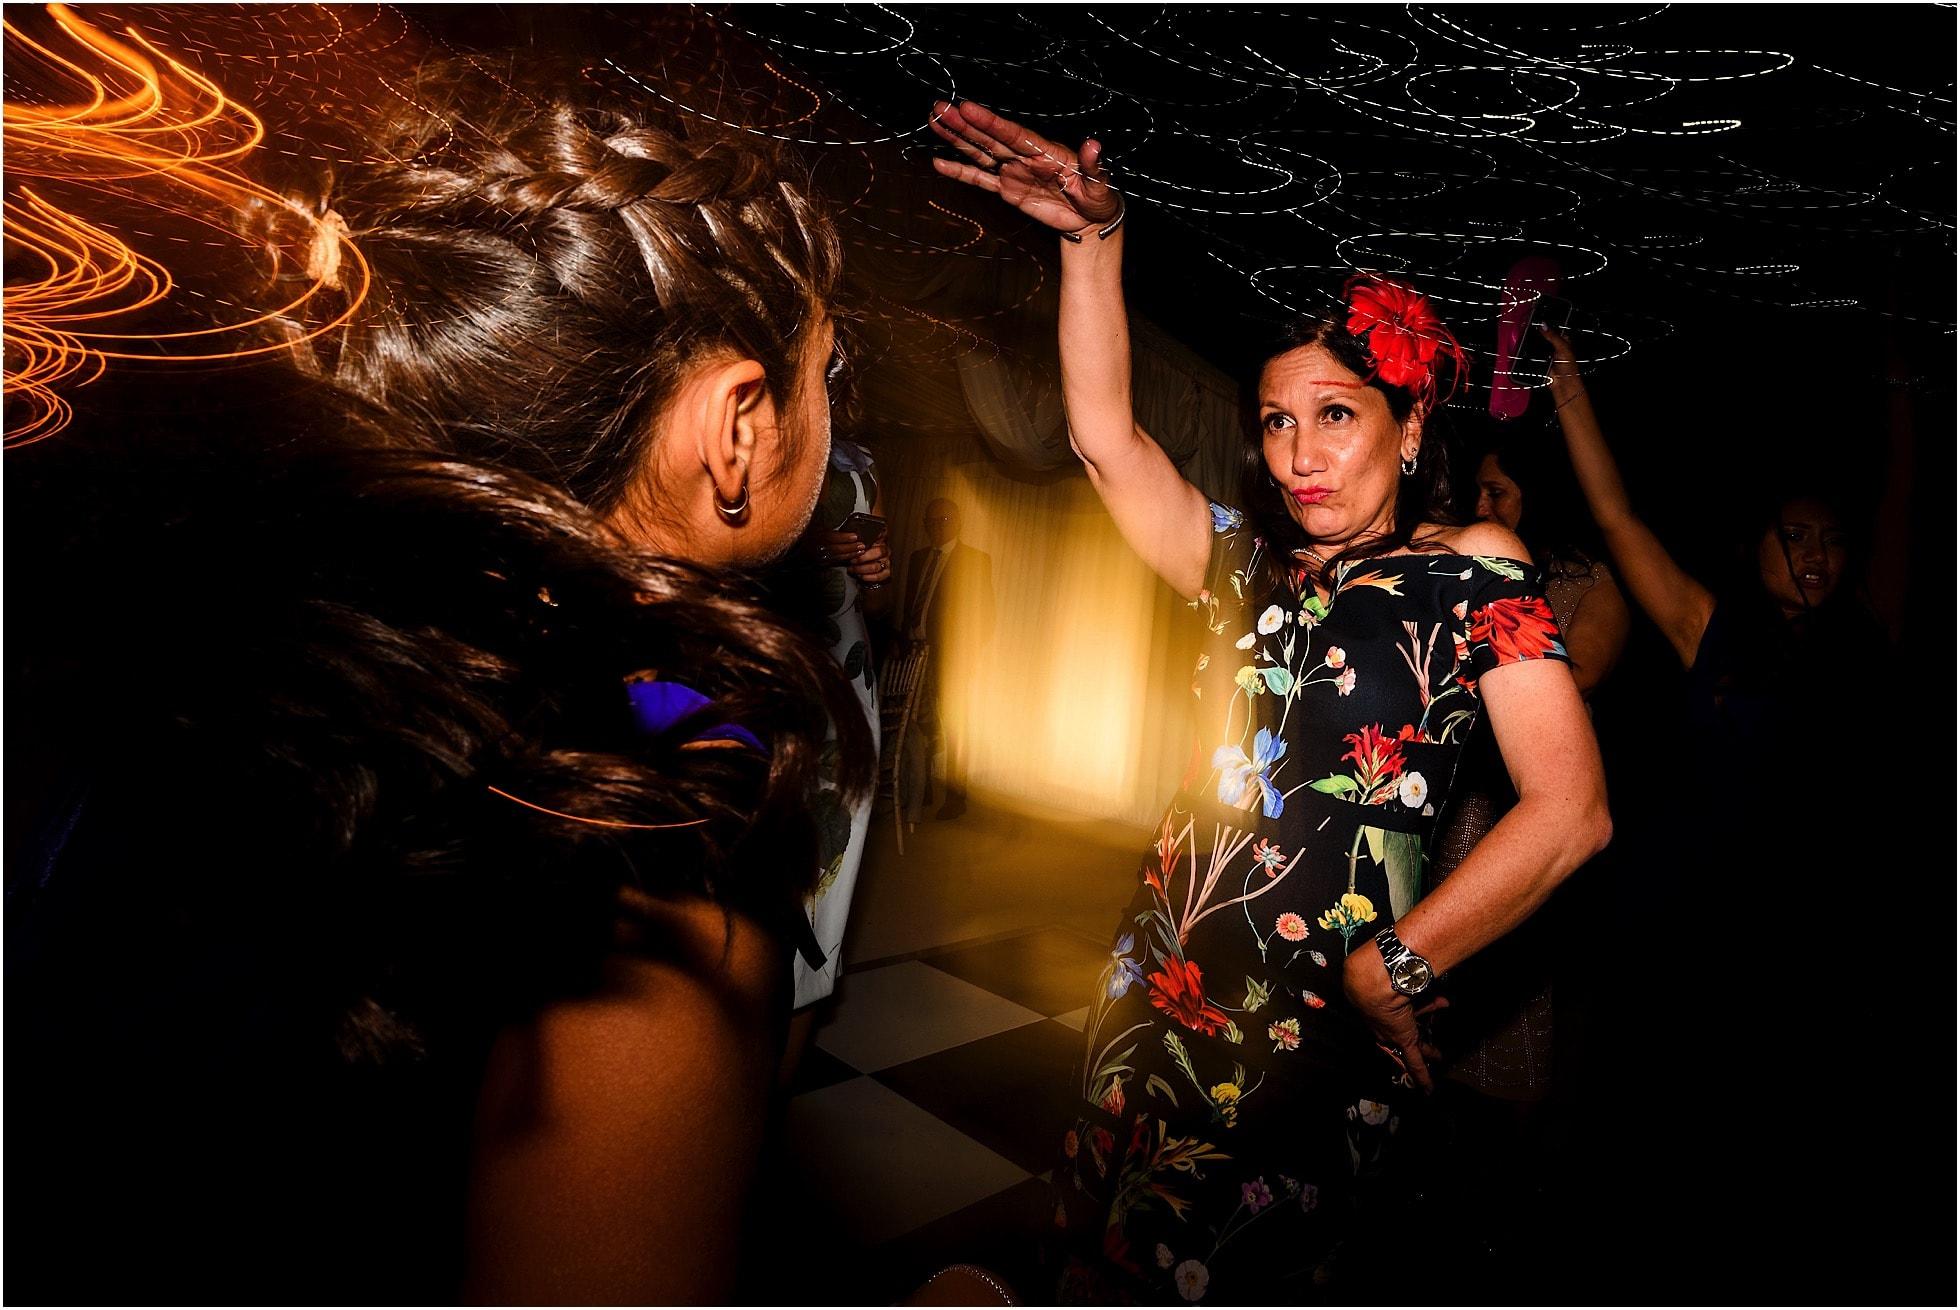 dancing action shots